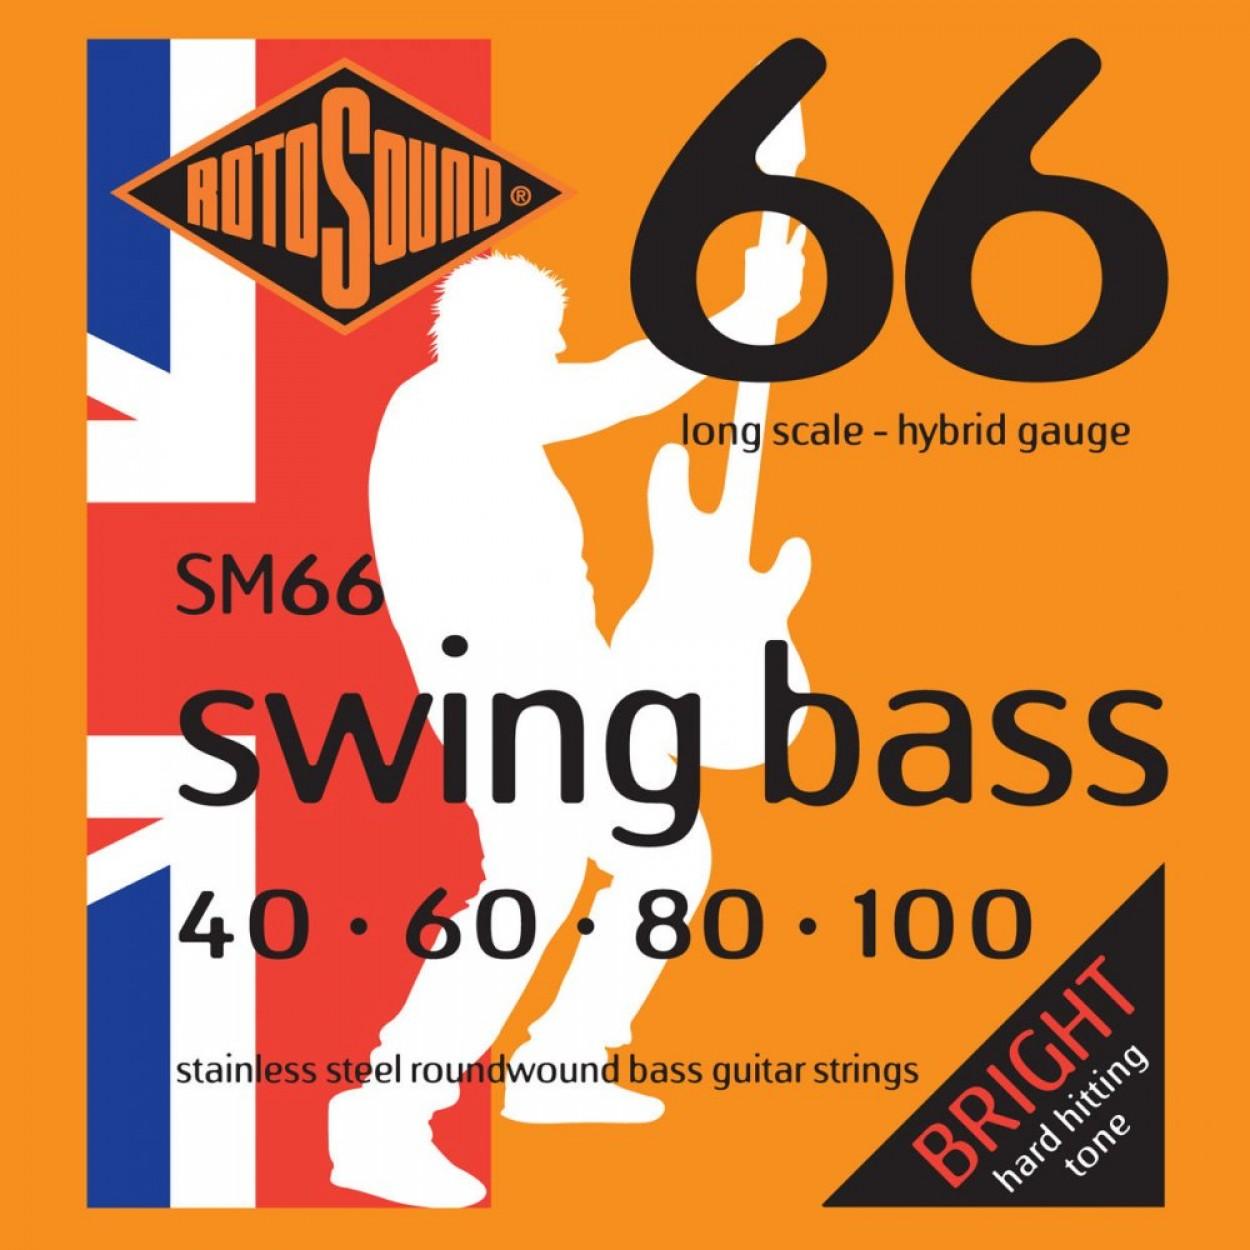 RotoSound 66 Swing Bass Strings 40-100